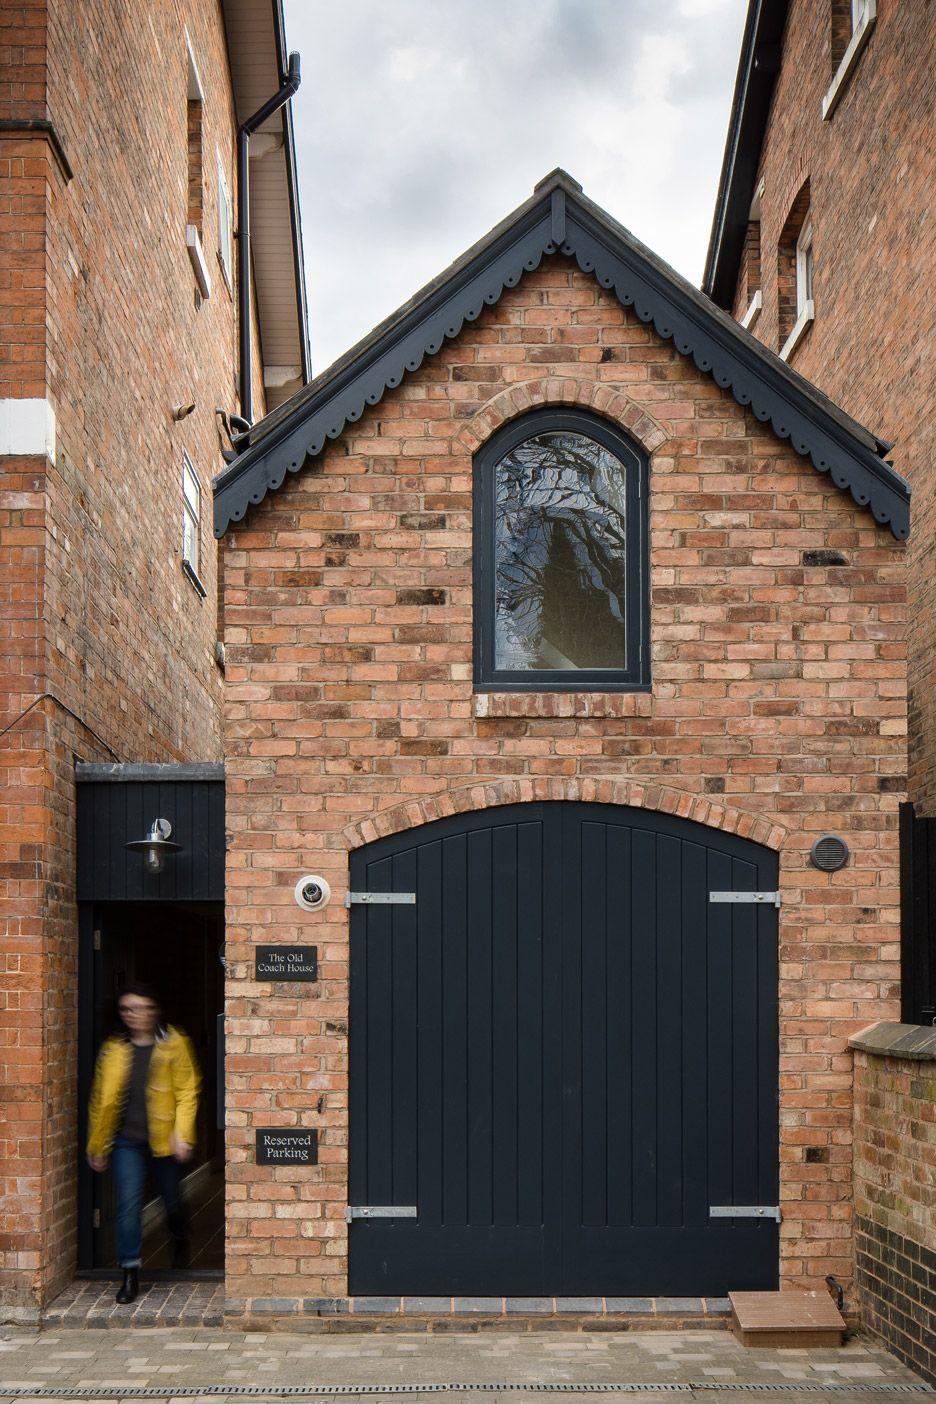 writers-coach-house-intervention-architecture-studio-renovation-moseley-birmingham-england_dezeen_936_13